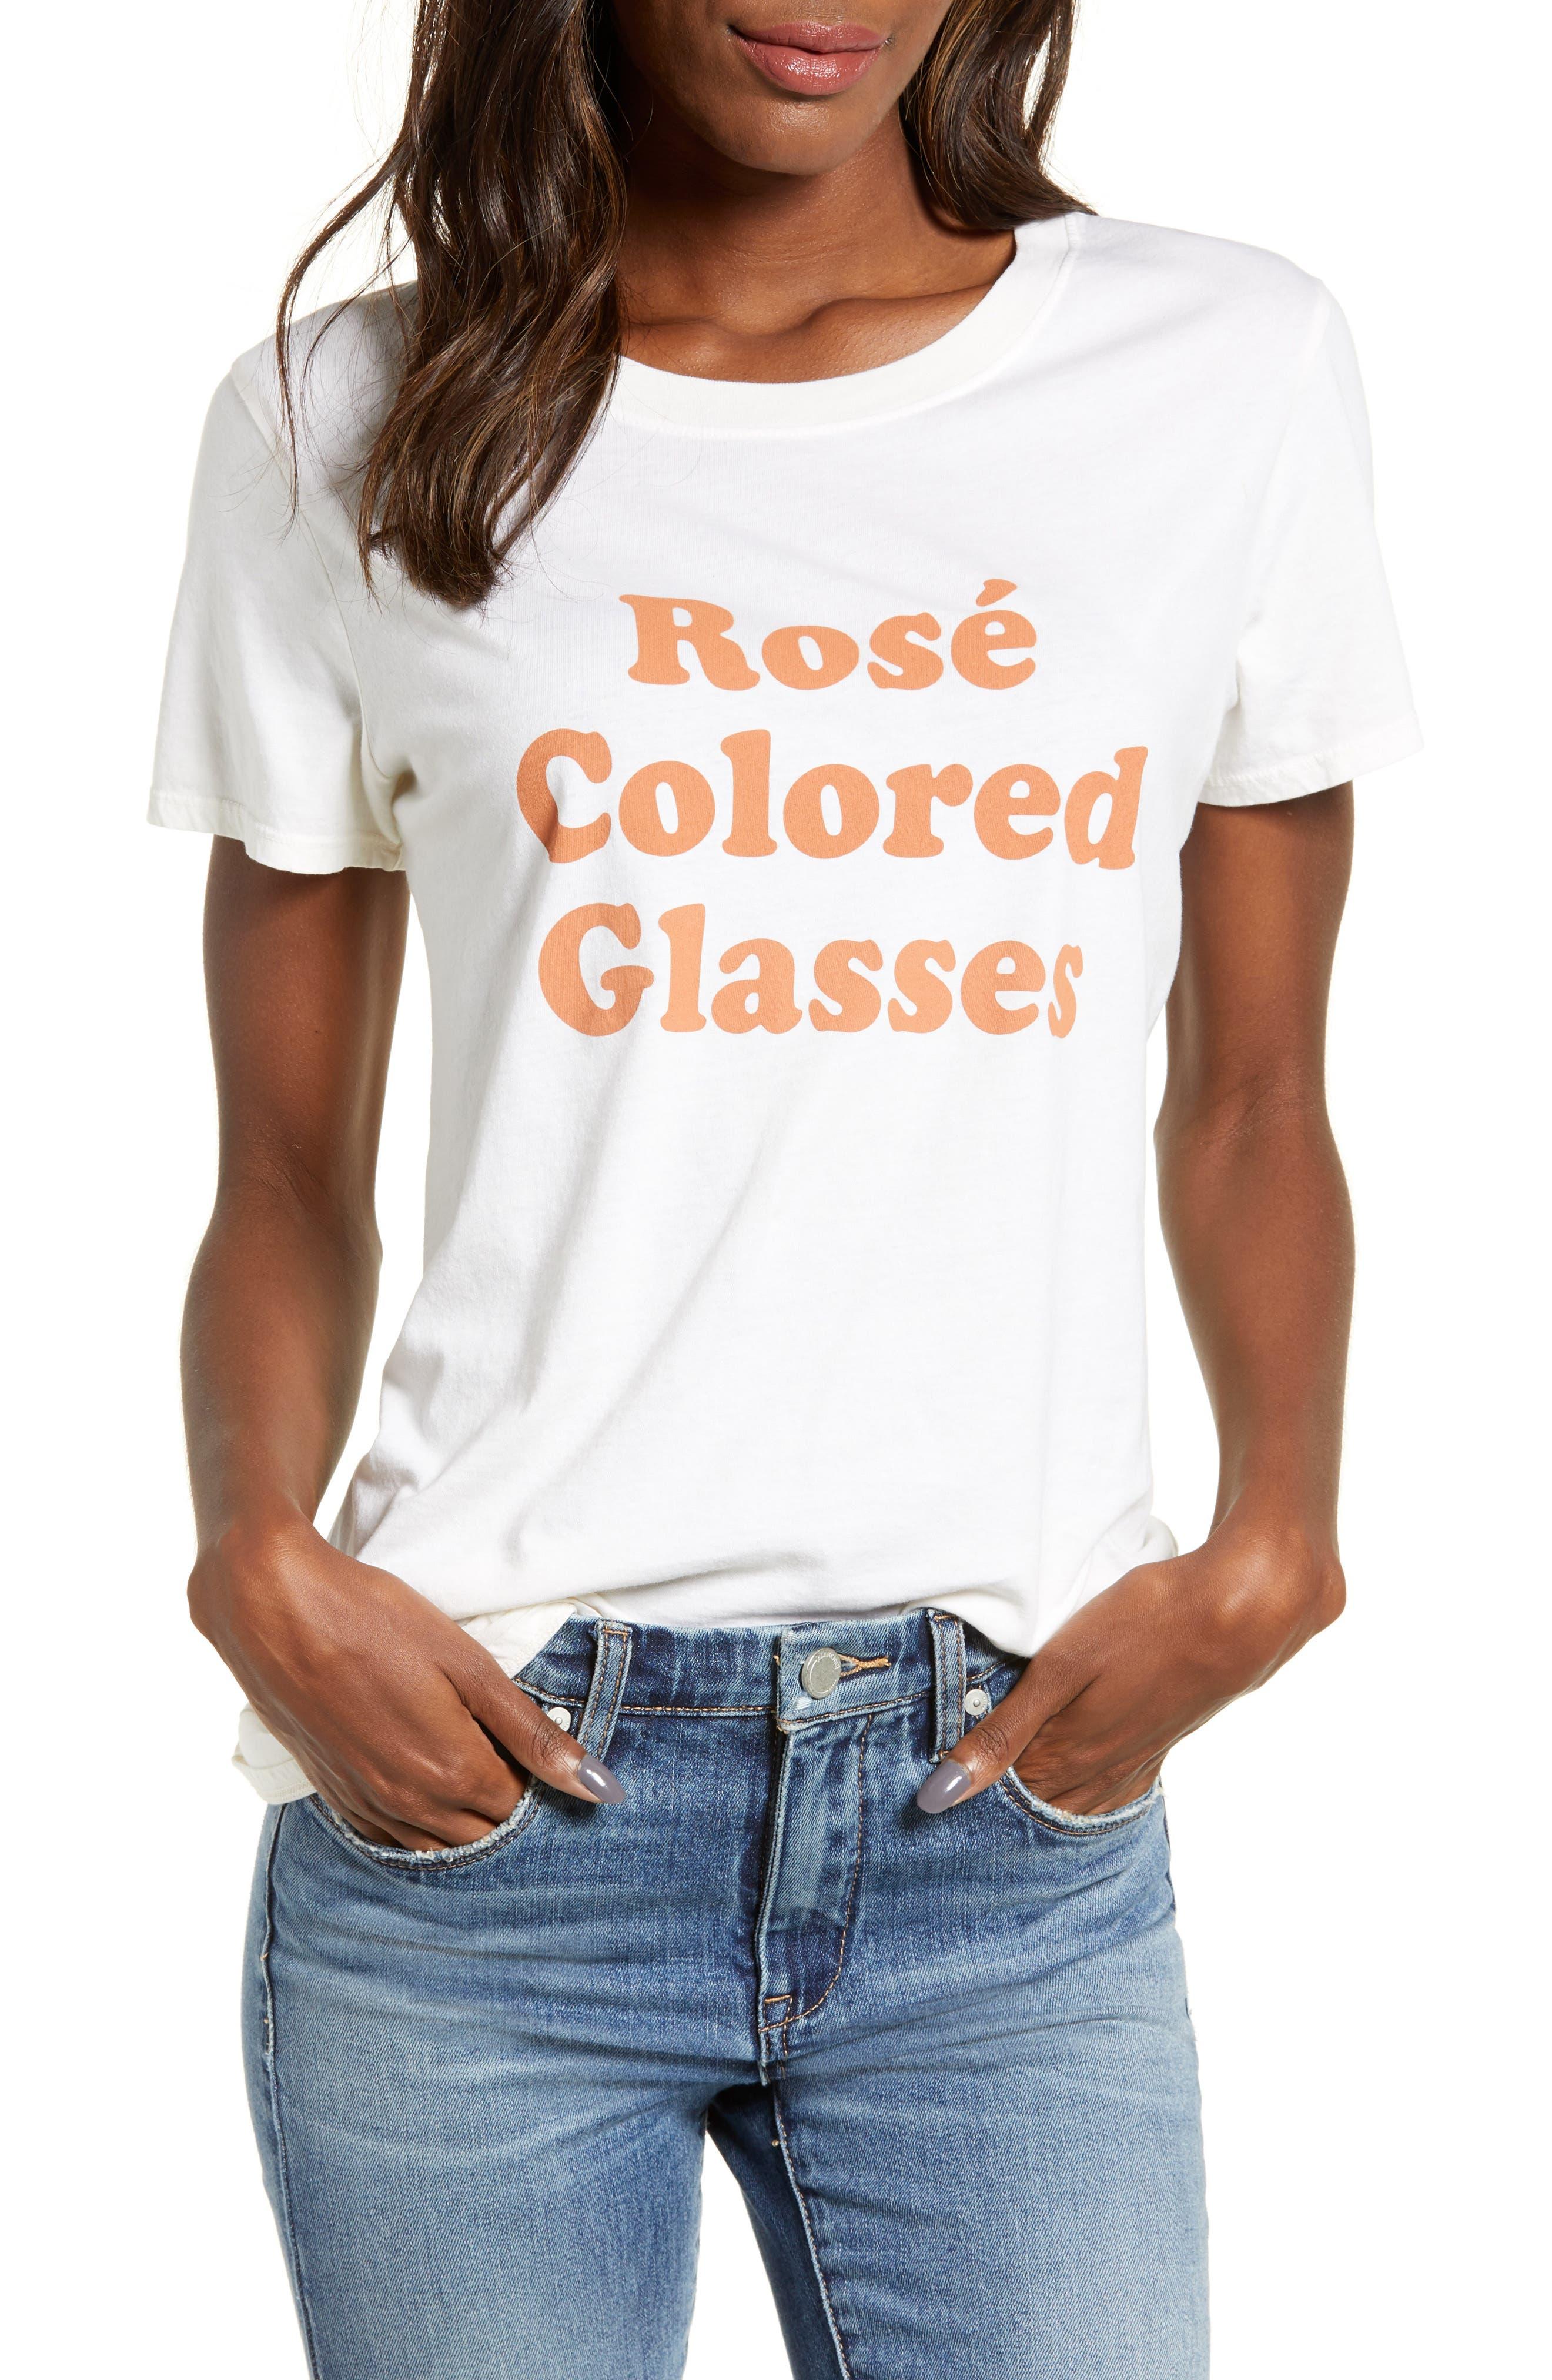 SUB_URBAN RIOT Rose Colored Glasses in Antique White